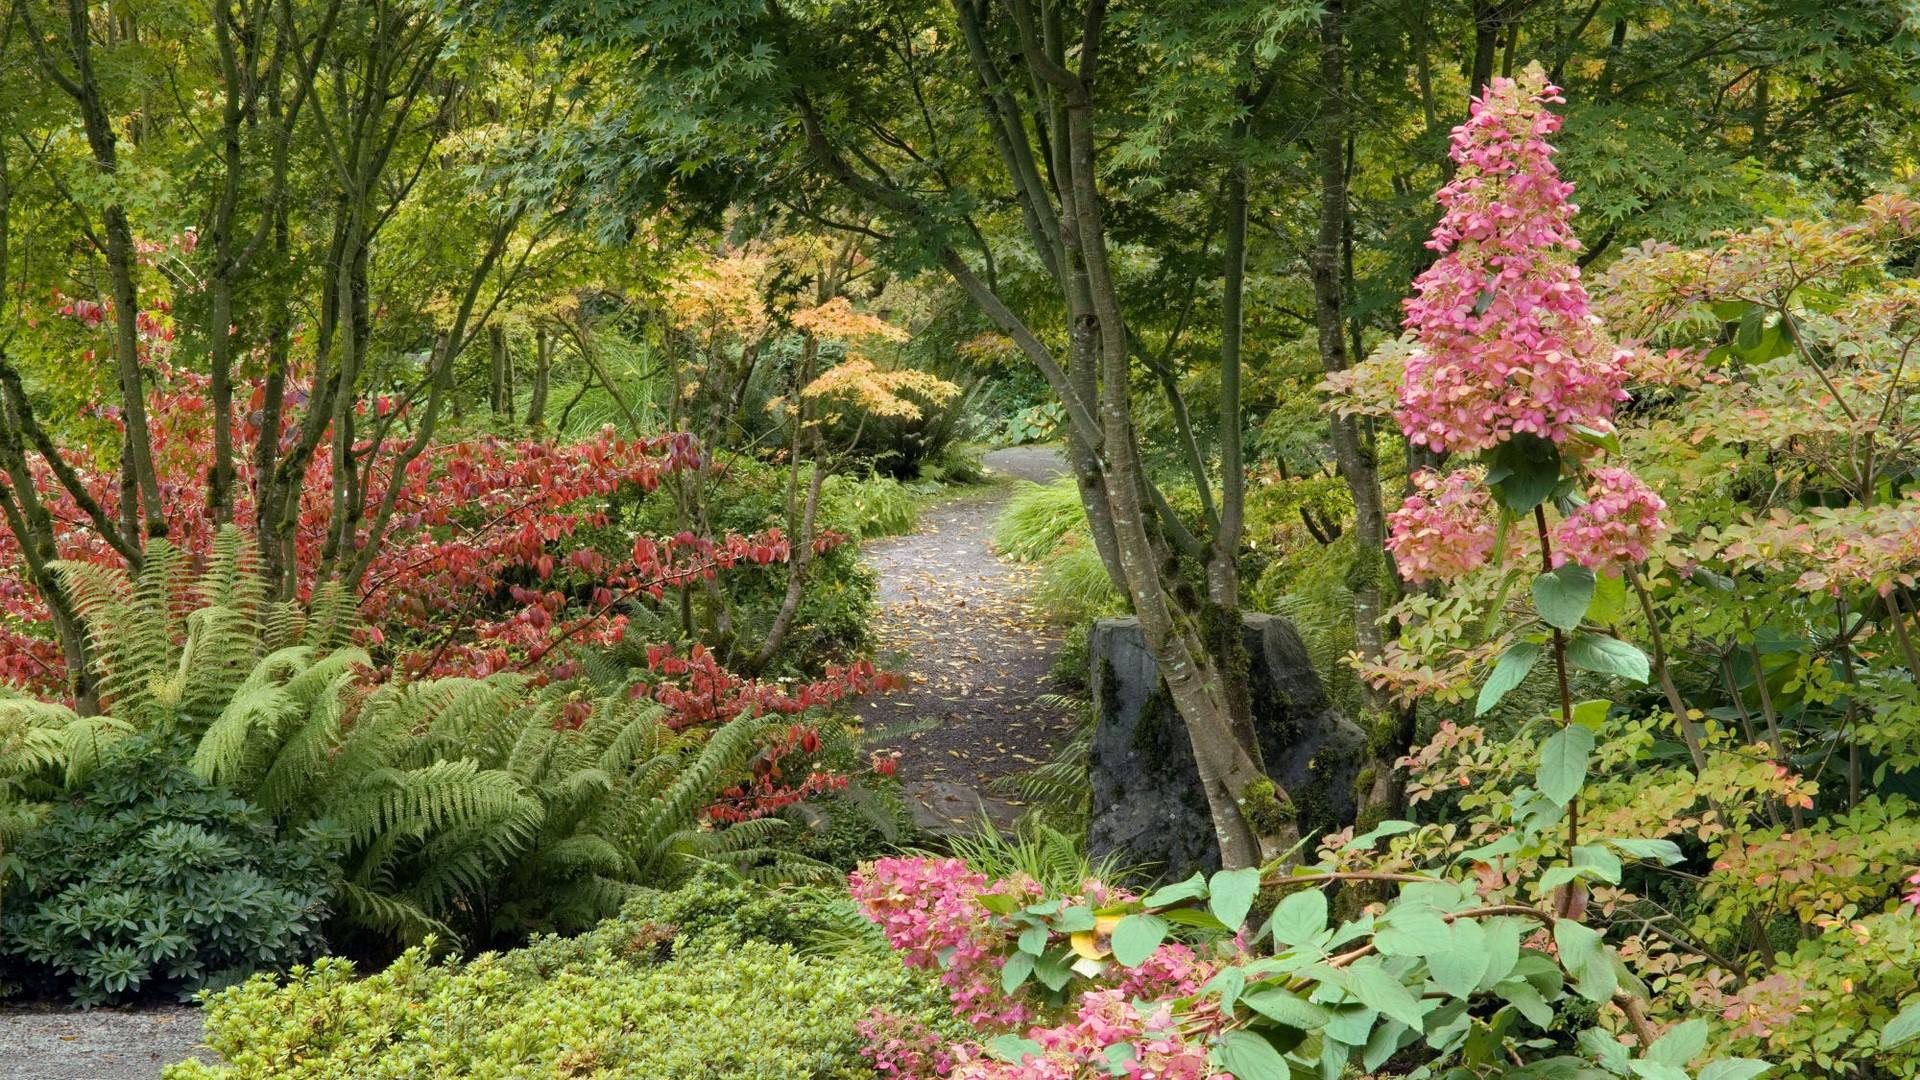 Beautiful HD Garden Image Download HD Wallpapers 1920x1080